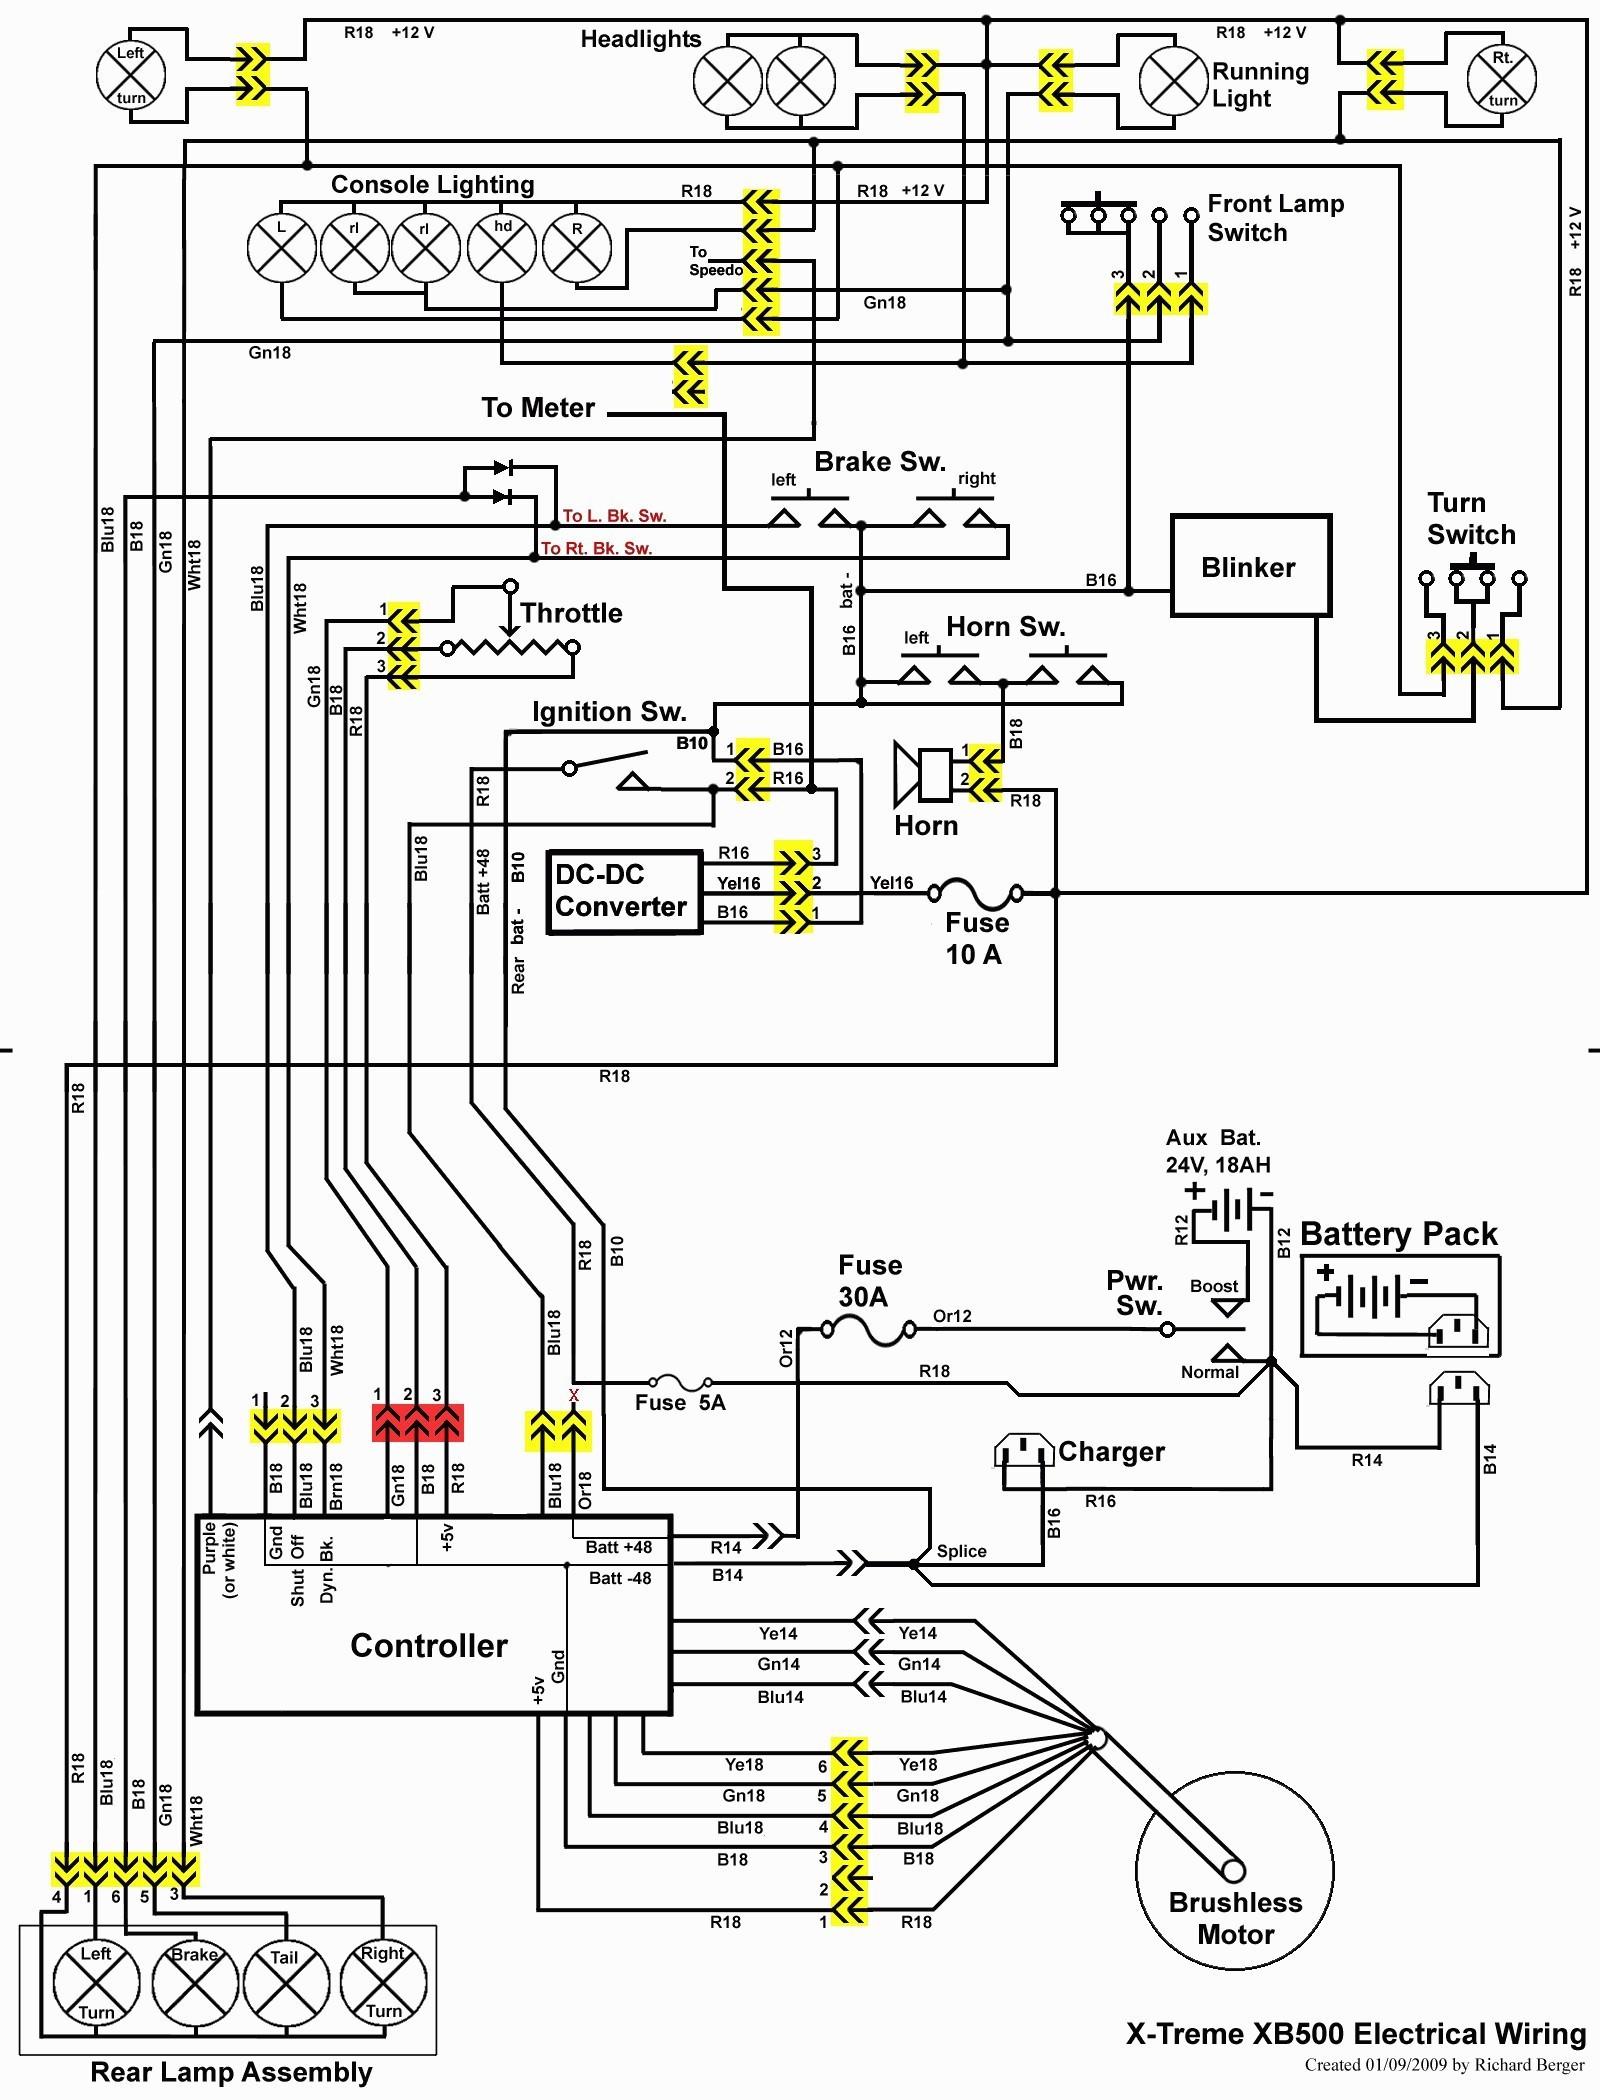 razor e100 scooter schematics wiring diagram Razor E100 Wiring Schematic 150cc tank wiring diagram all diagram